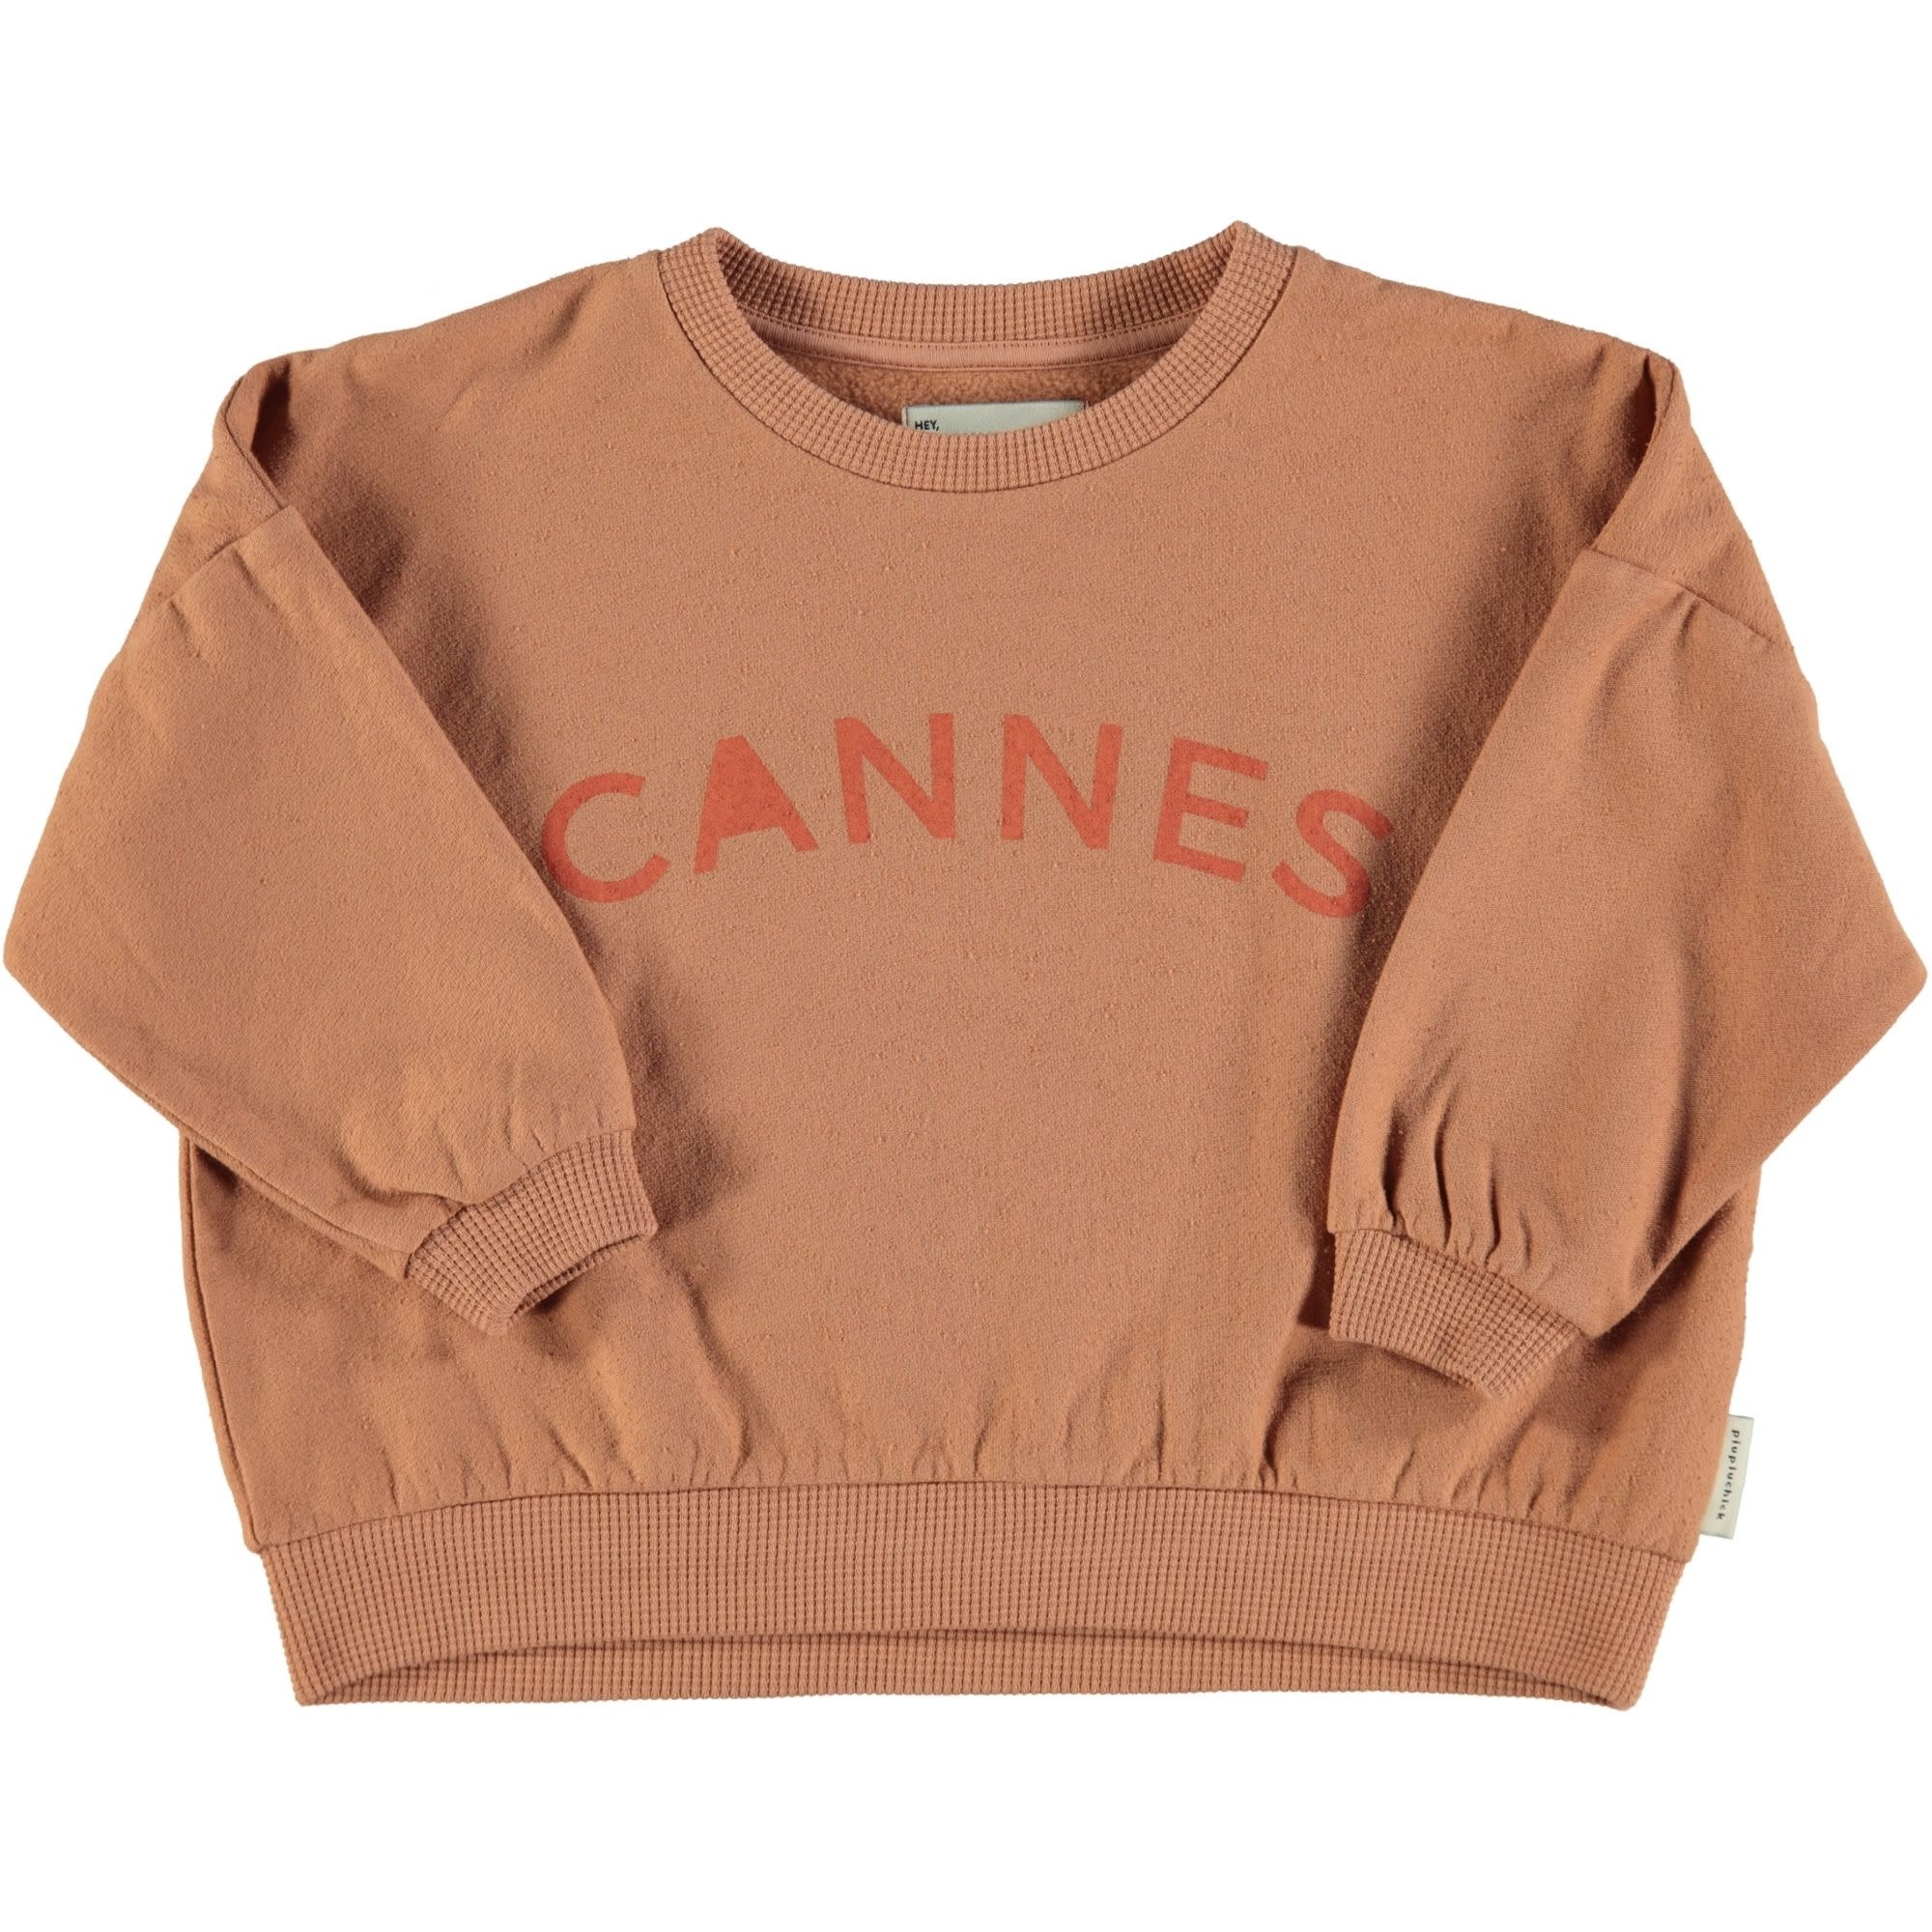 Piupiuchick Piupiuchick - Unisex sweatshirt nut with cannes print